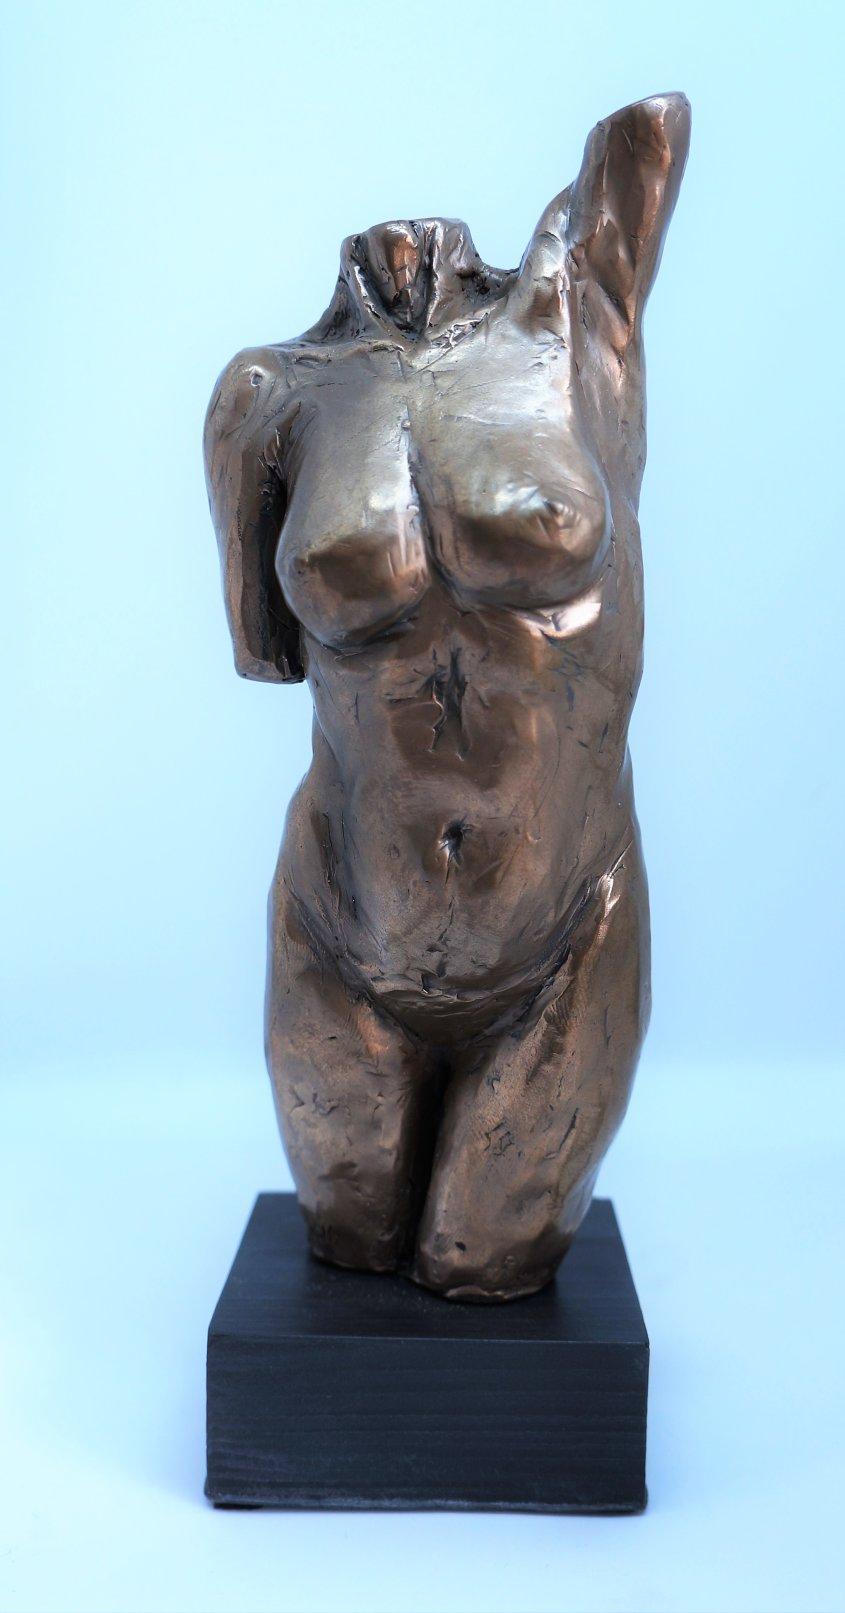 Torso, cold cast bronze, £55